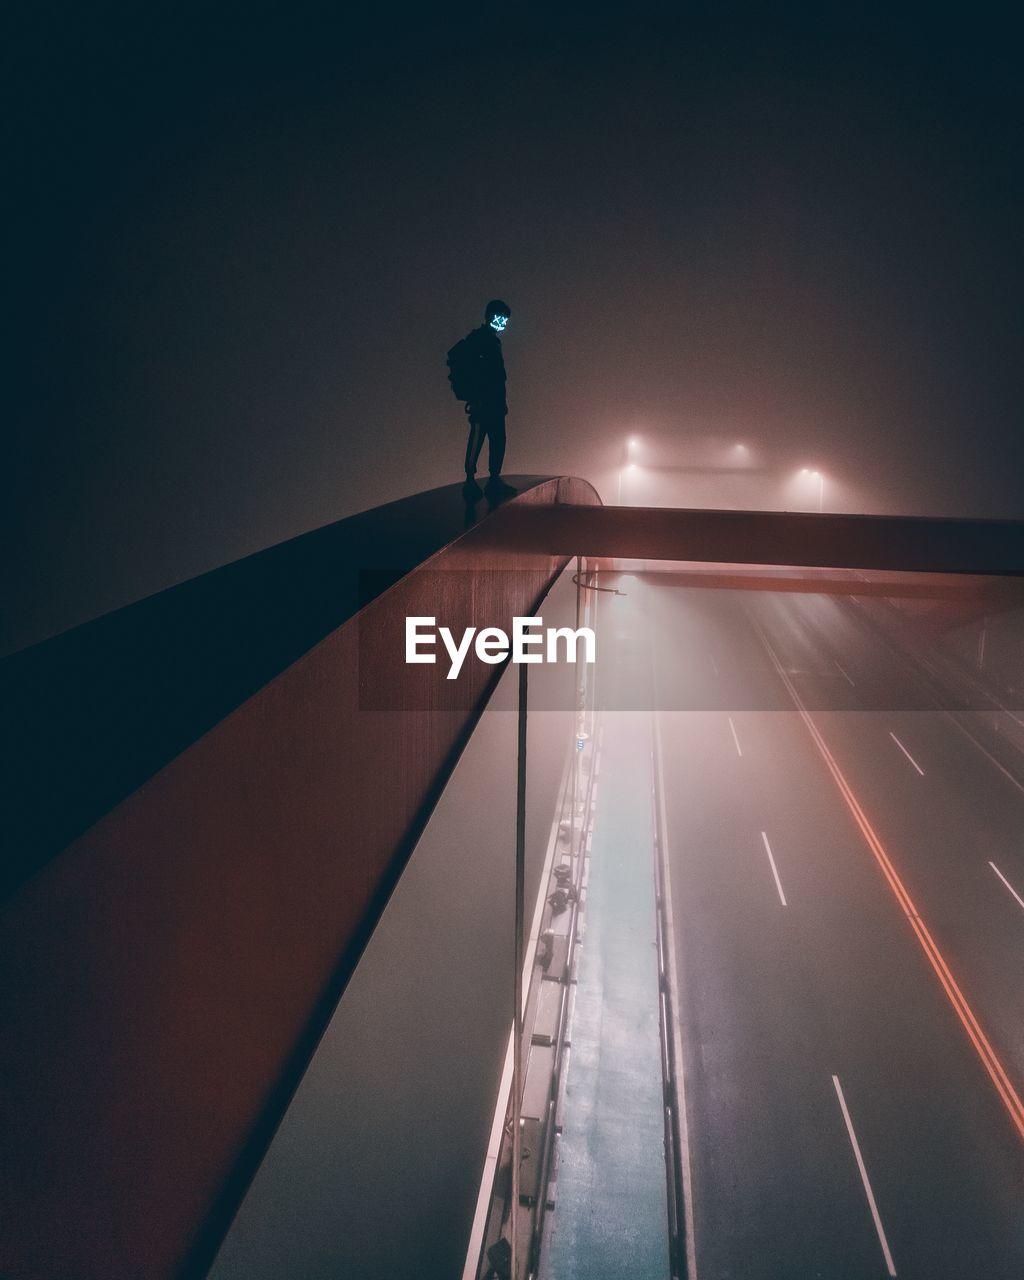 SILHOUETTE MAN ON ILLUMINATED ROAD AT NIGHT